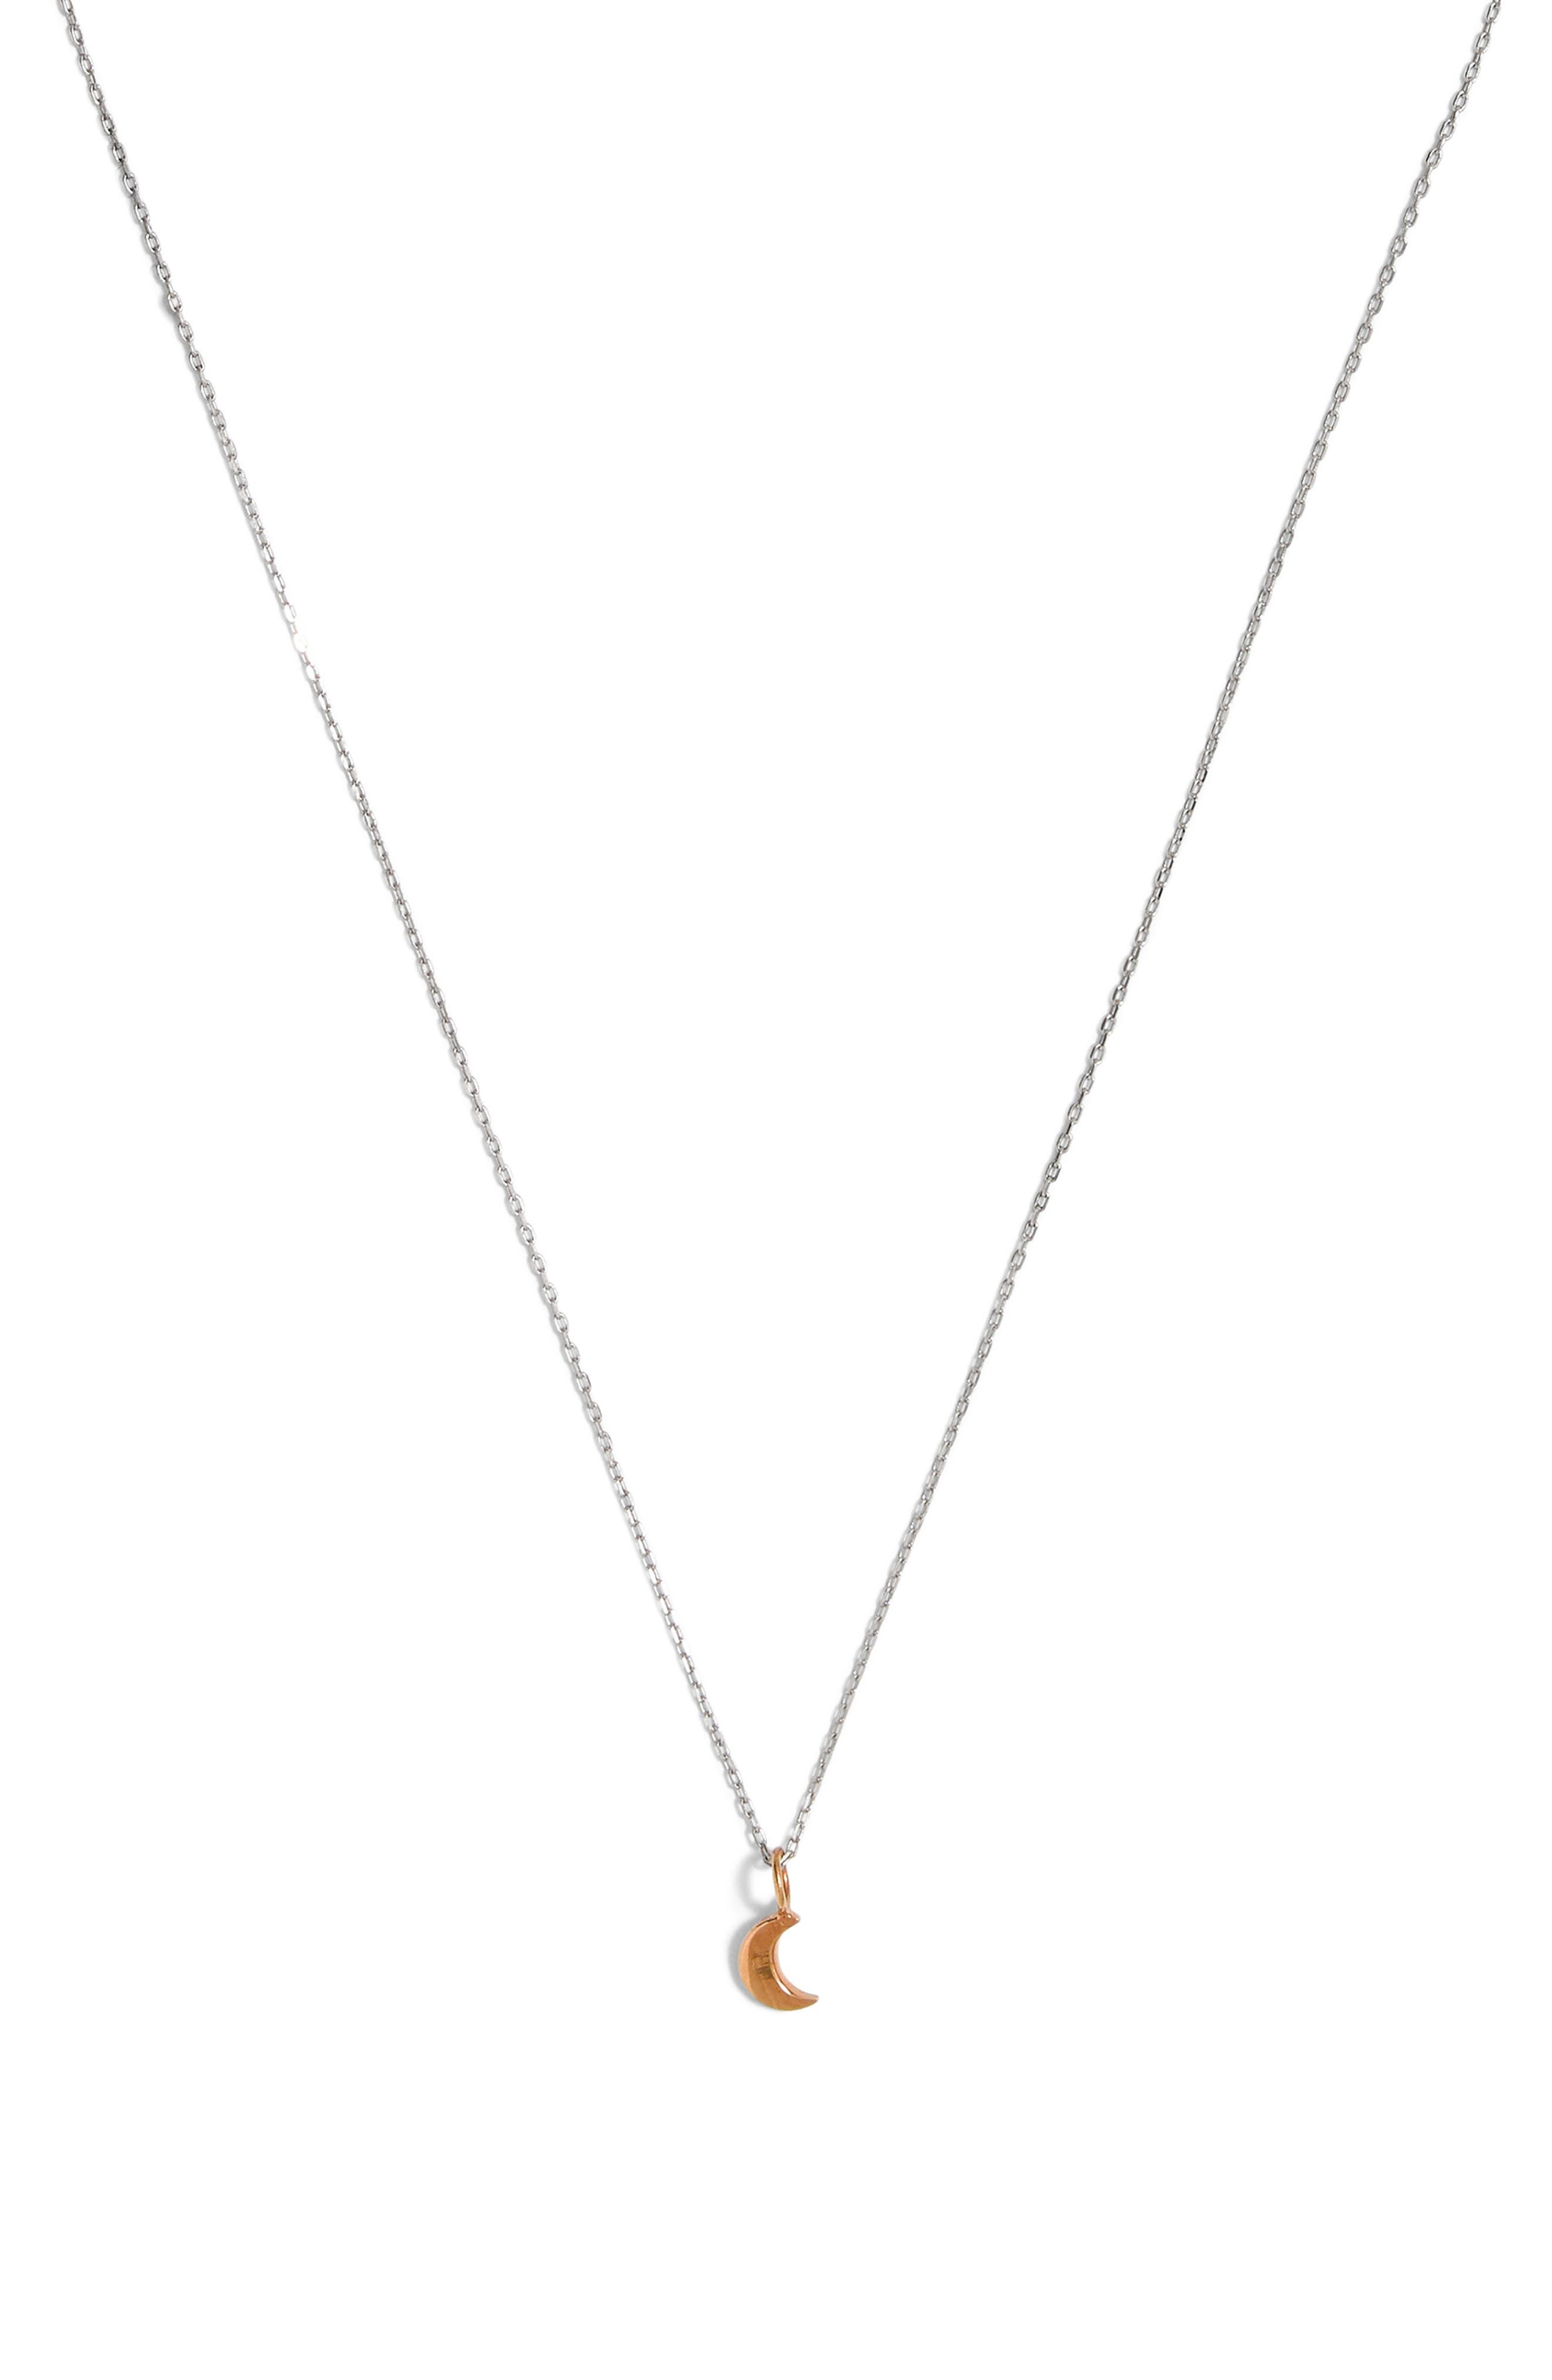 MADEWELL, Vermeil Crescent Moon Charm Necklace, Main thumbnail 1, color, VERMEIL